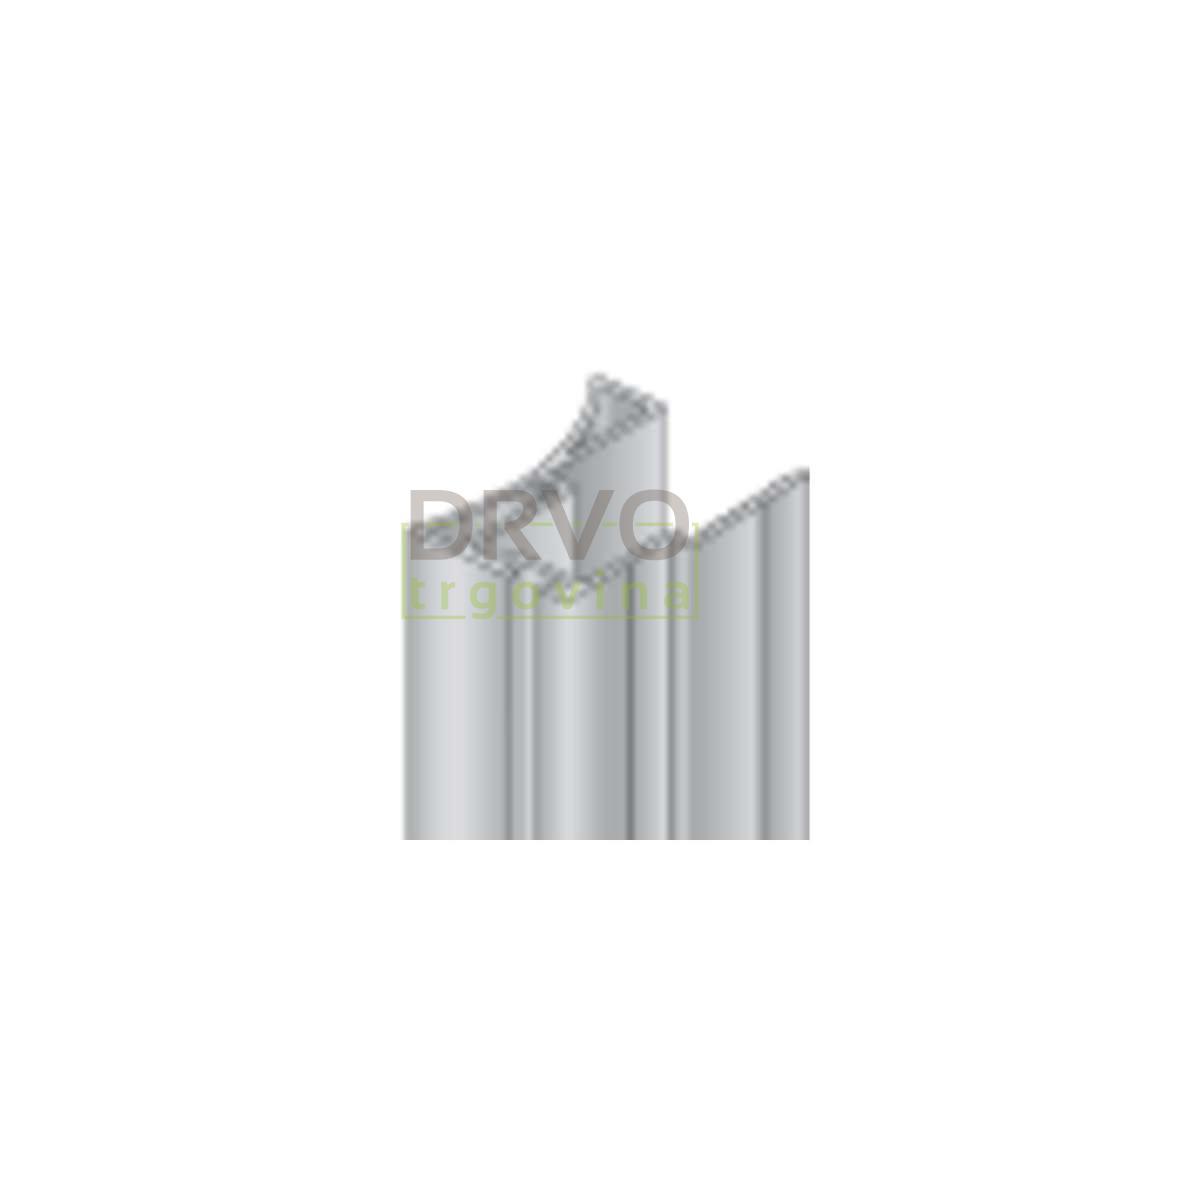 RUČKA SALU PROFILNA S14 2700mm 103335485